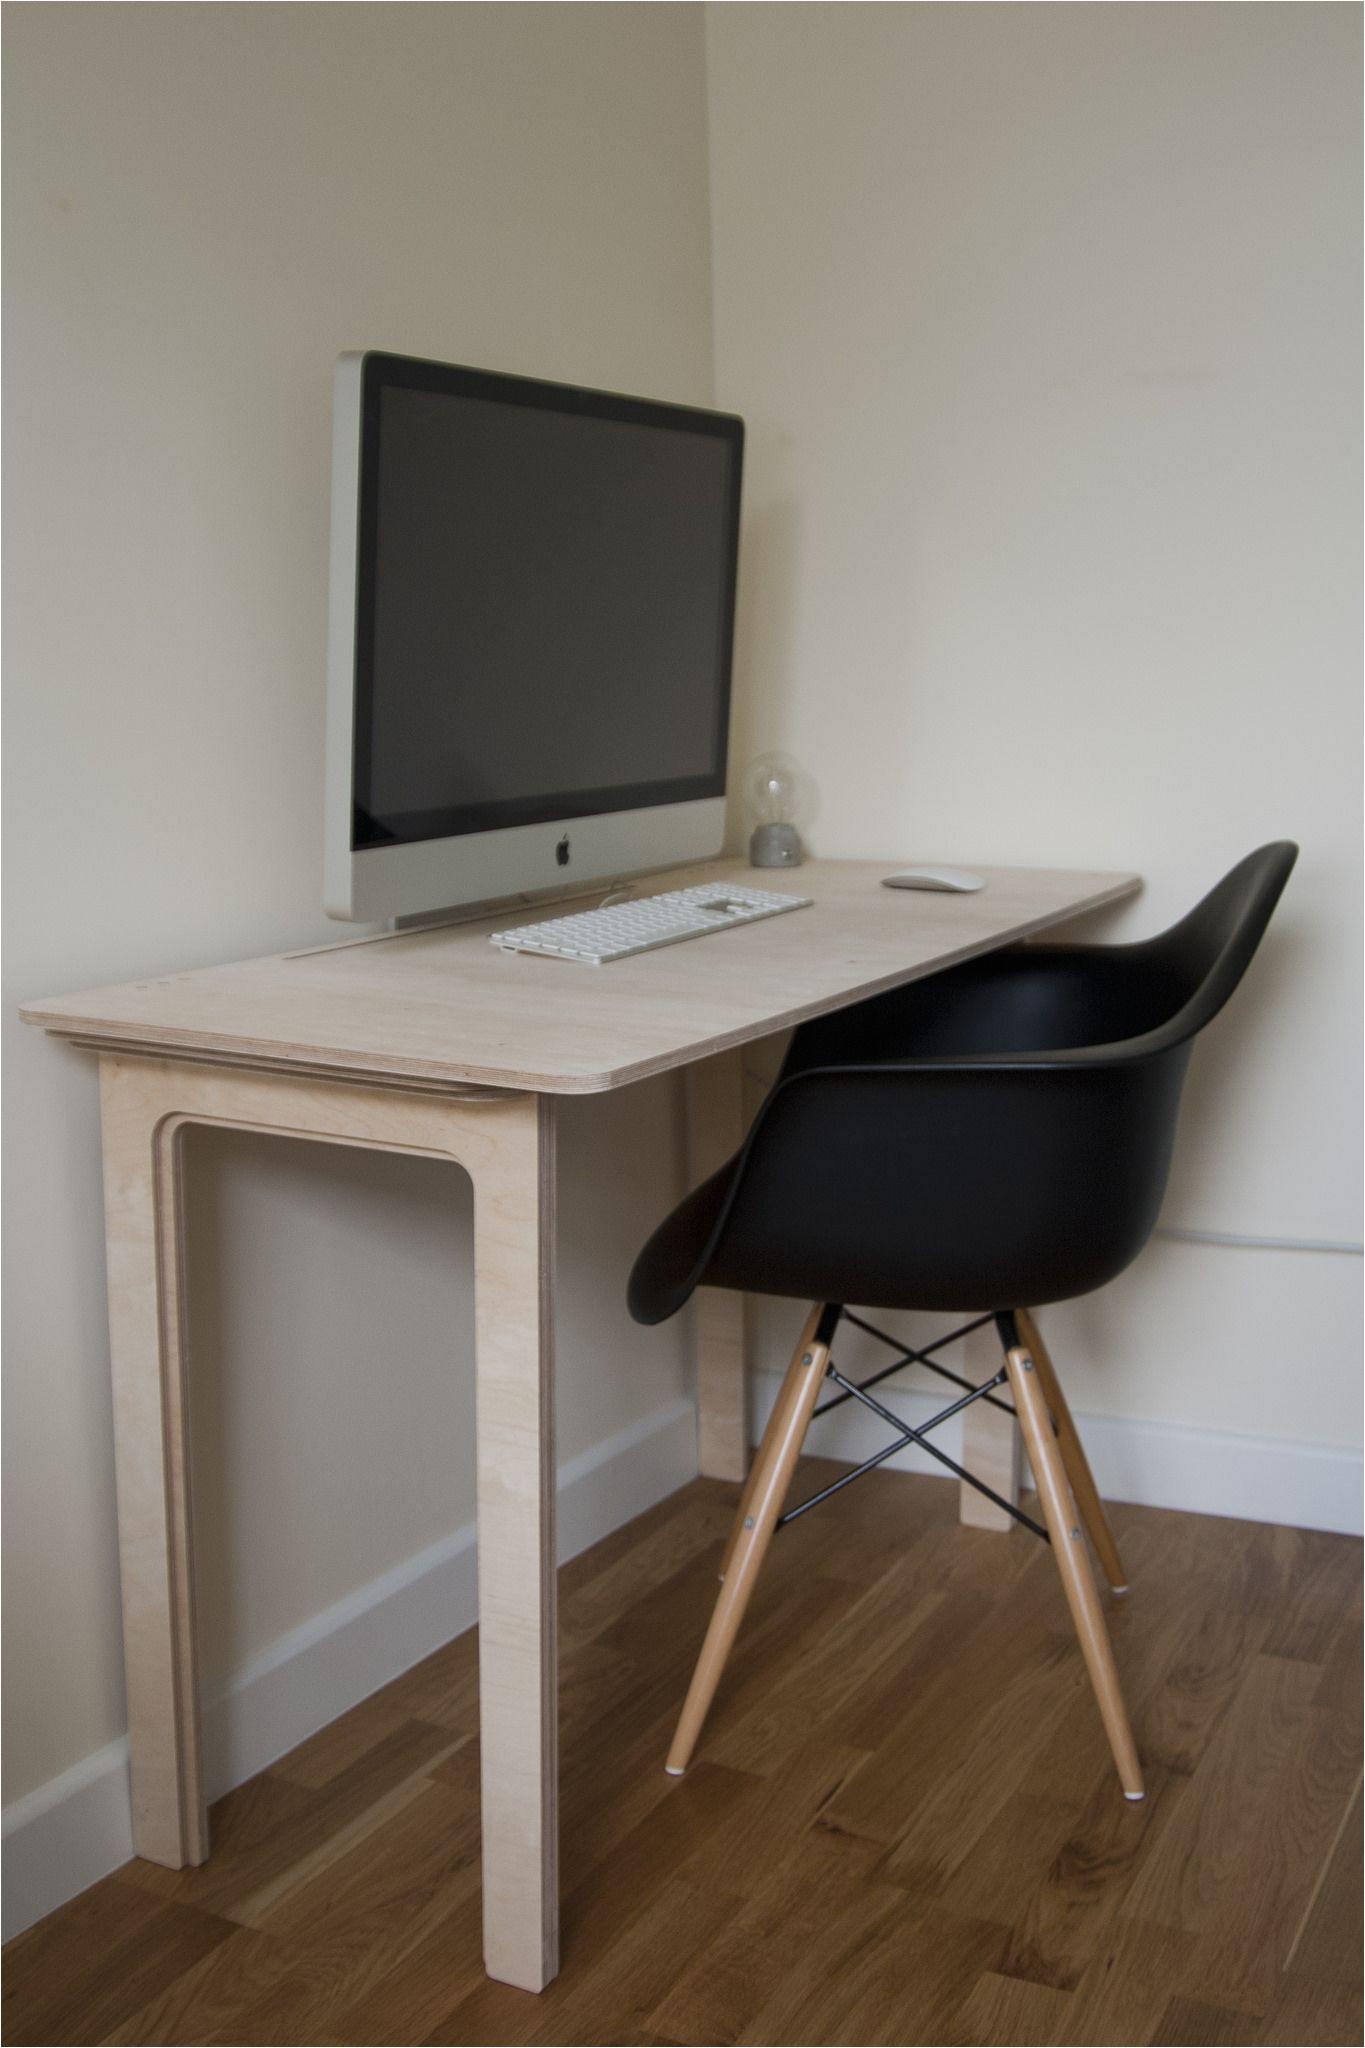 imac shelf diy unique cnc plywood desk designs of diy monitor stand wood of diy monitor stand wood jpg